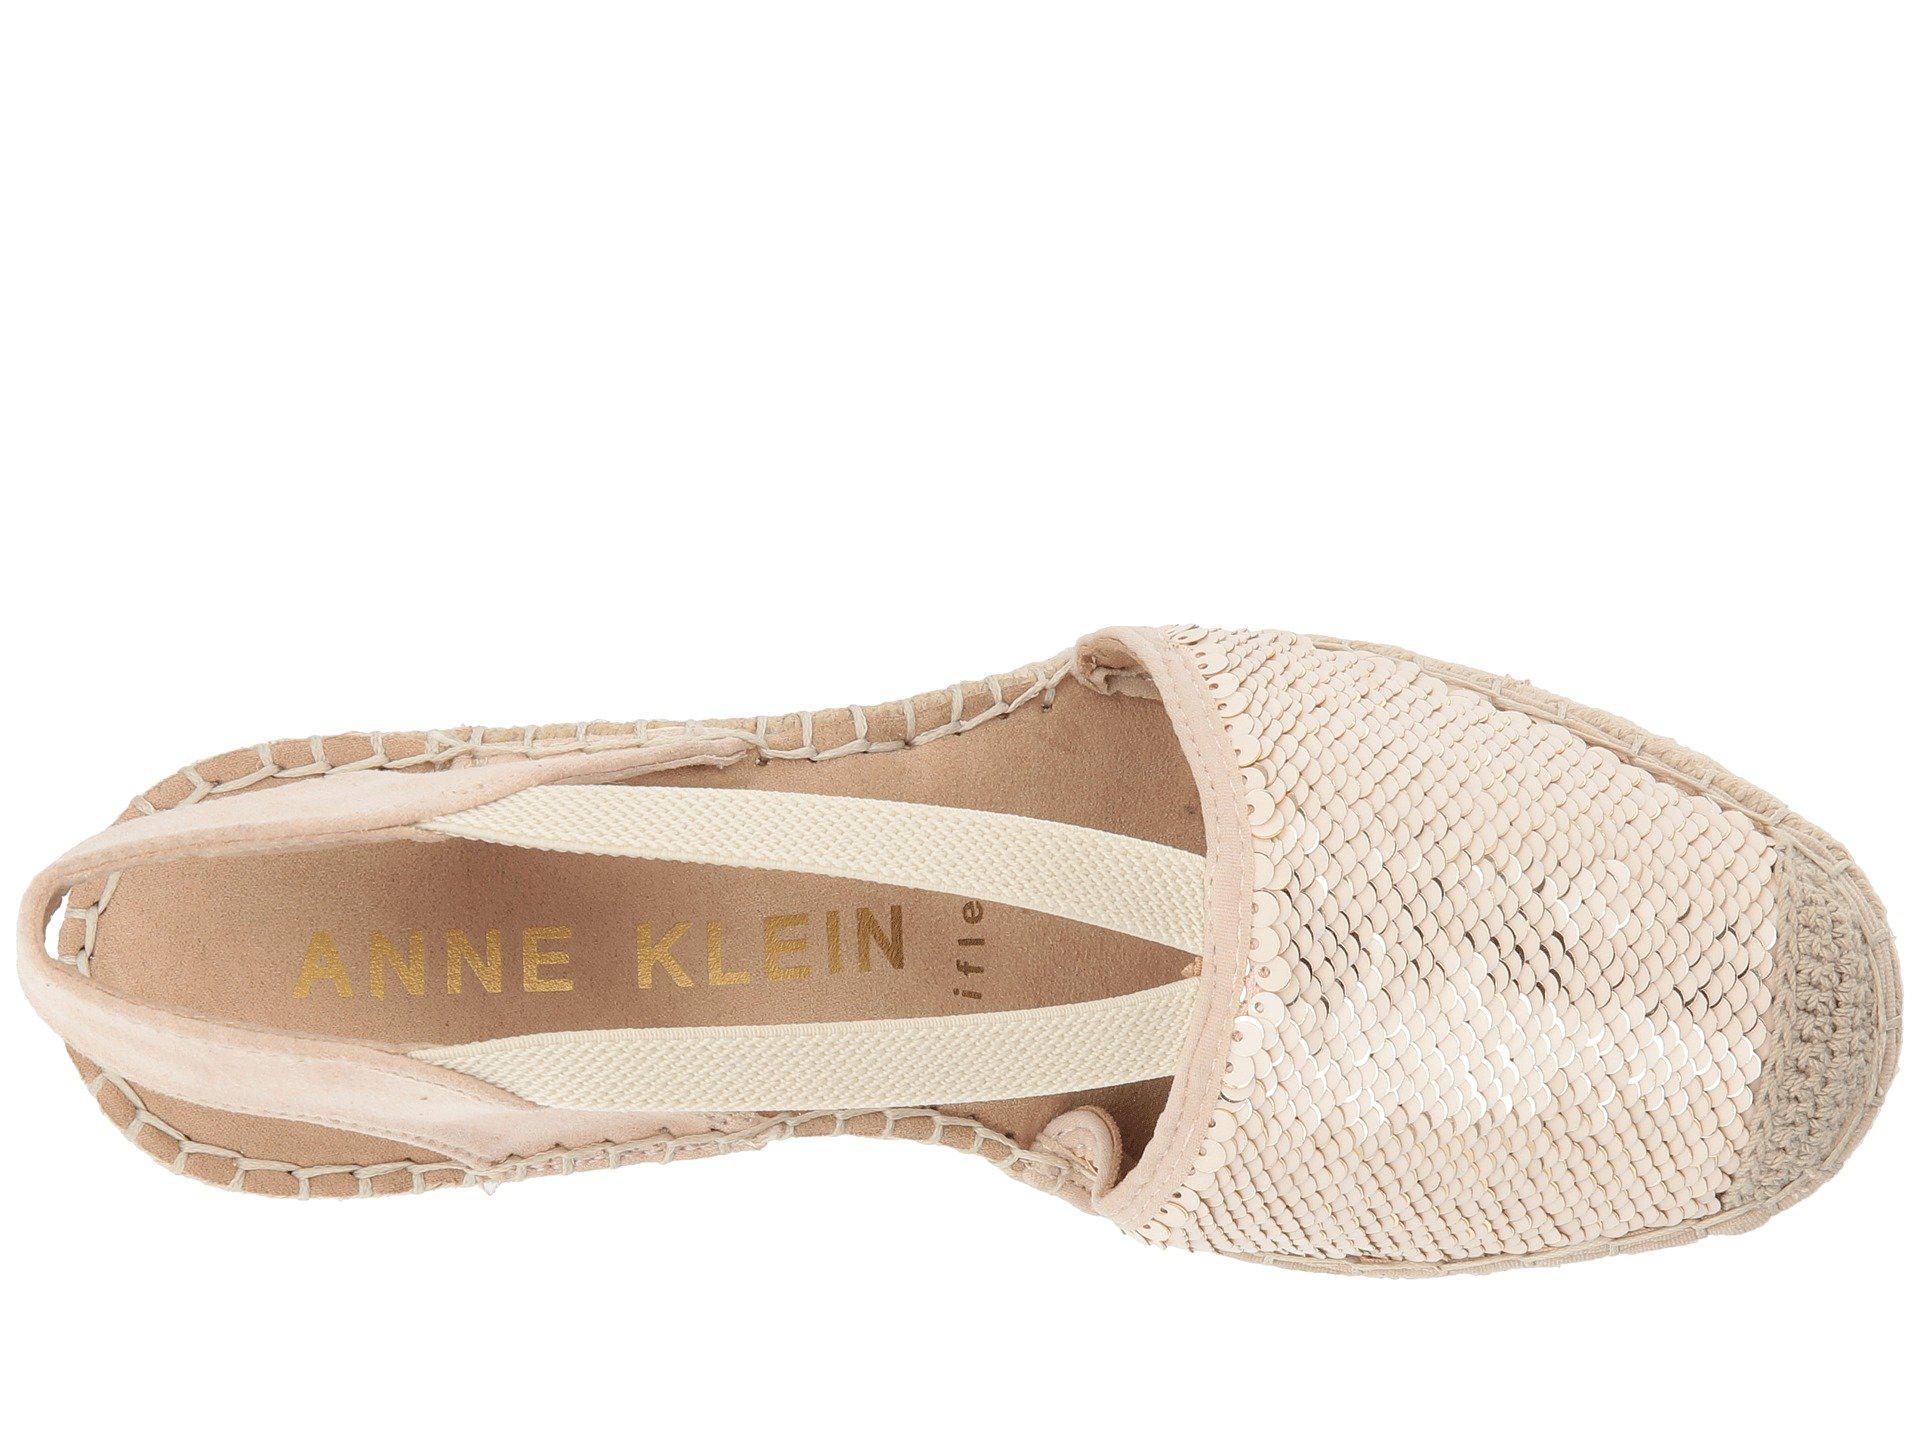 7e17216f1583 Lyst - Anne Klein Abbey (black Multi Fabric) Women s Wedge Shoes